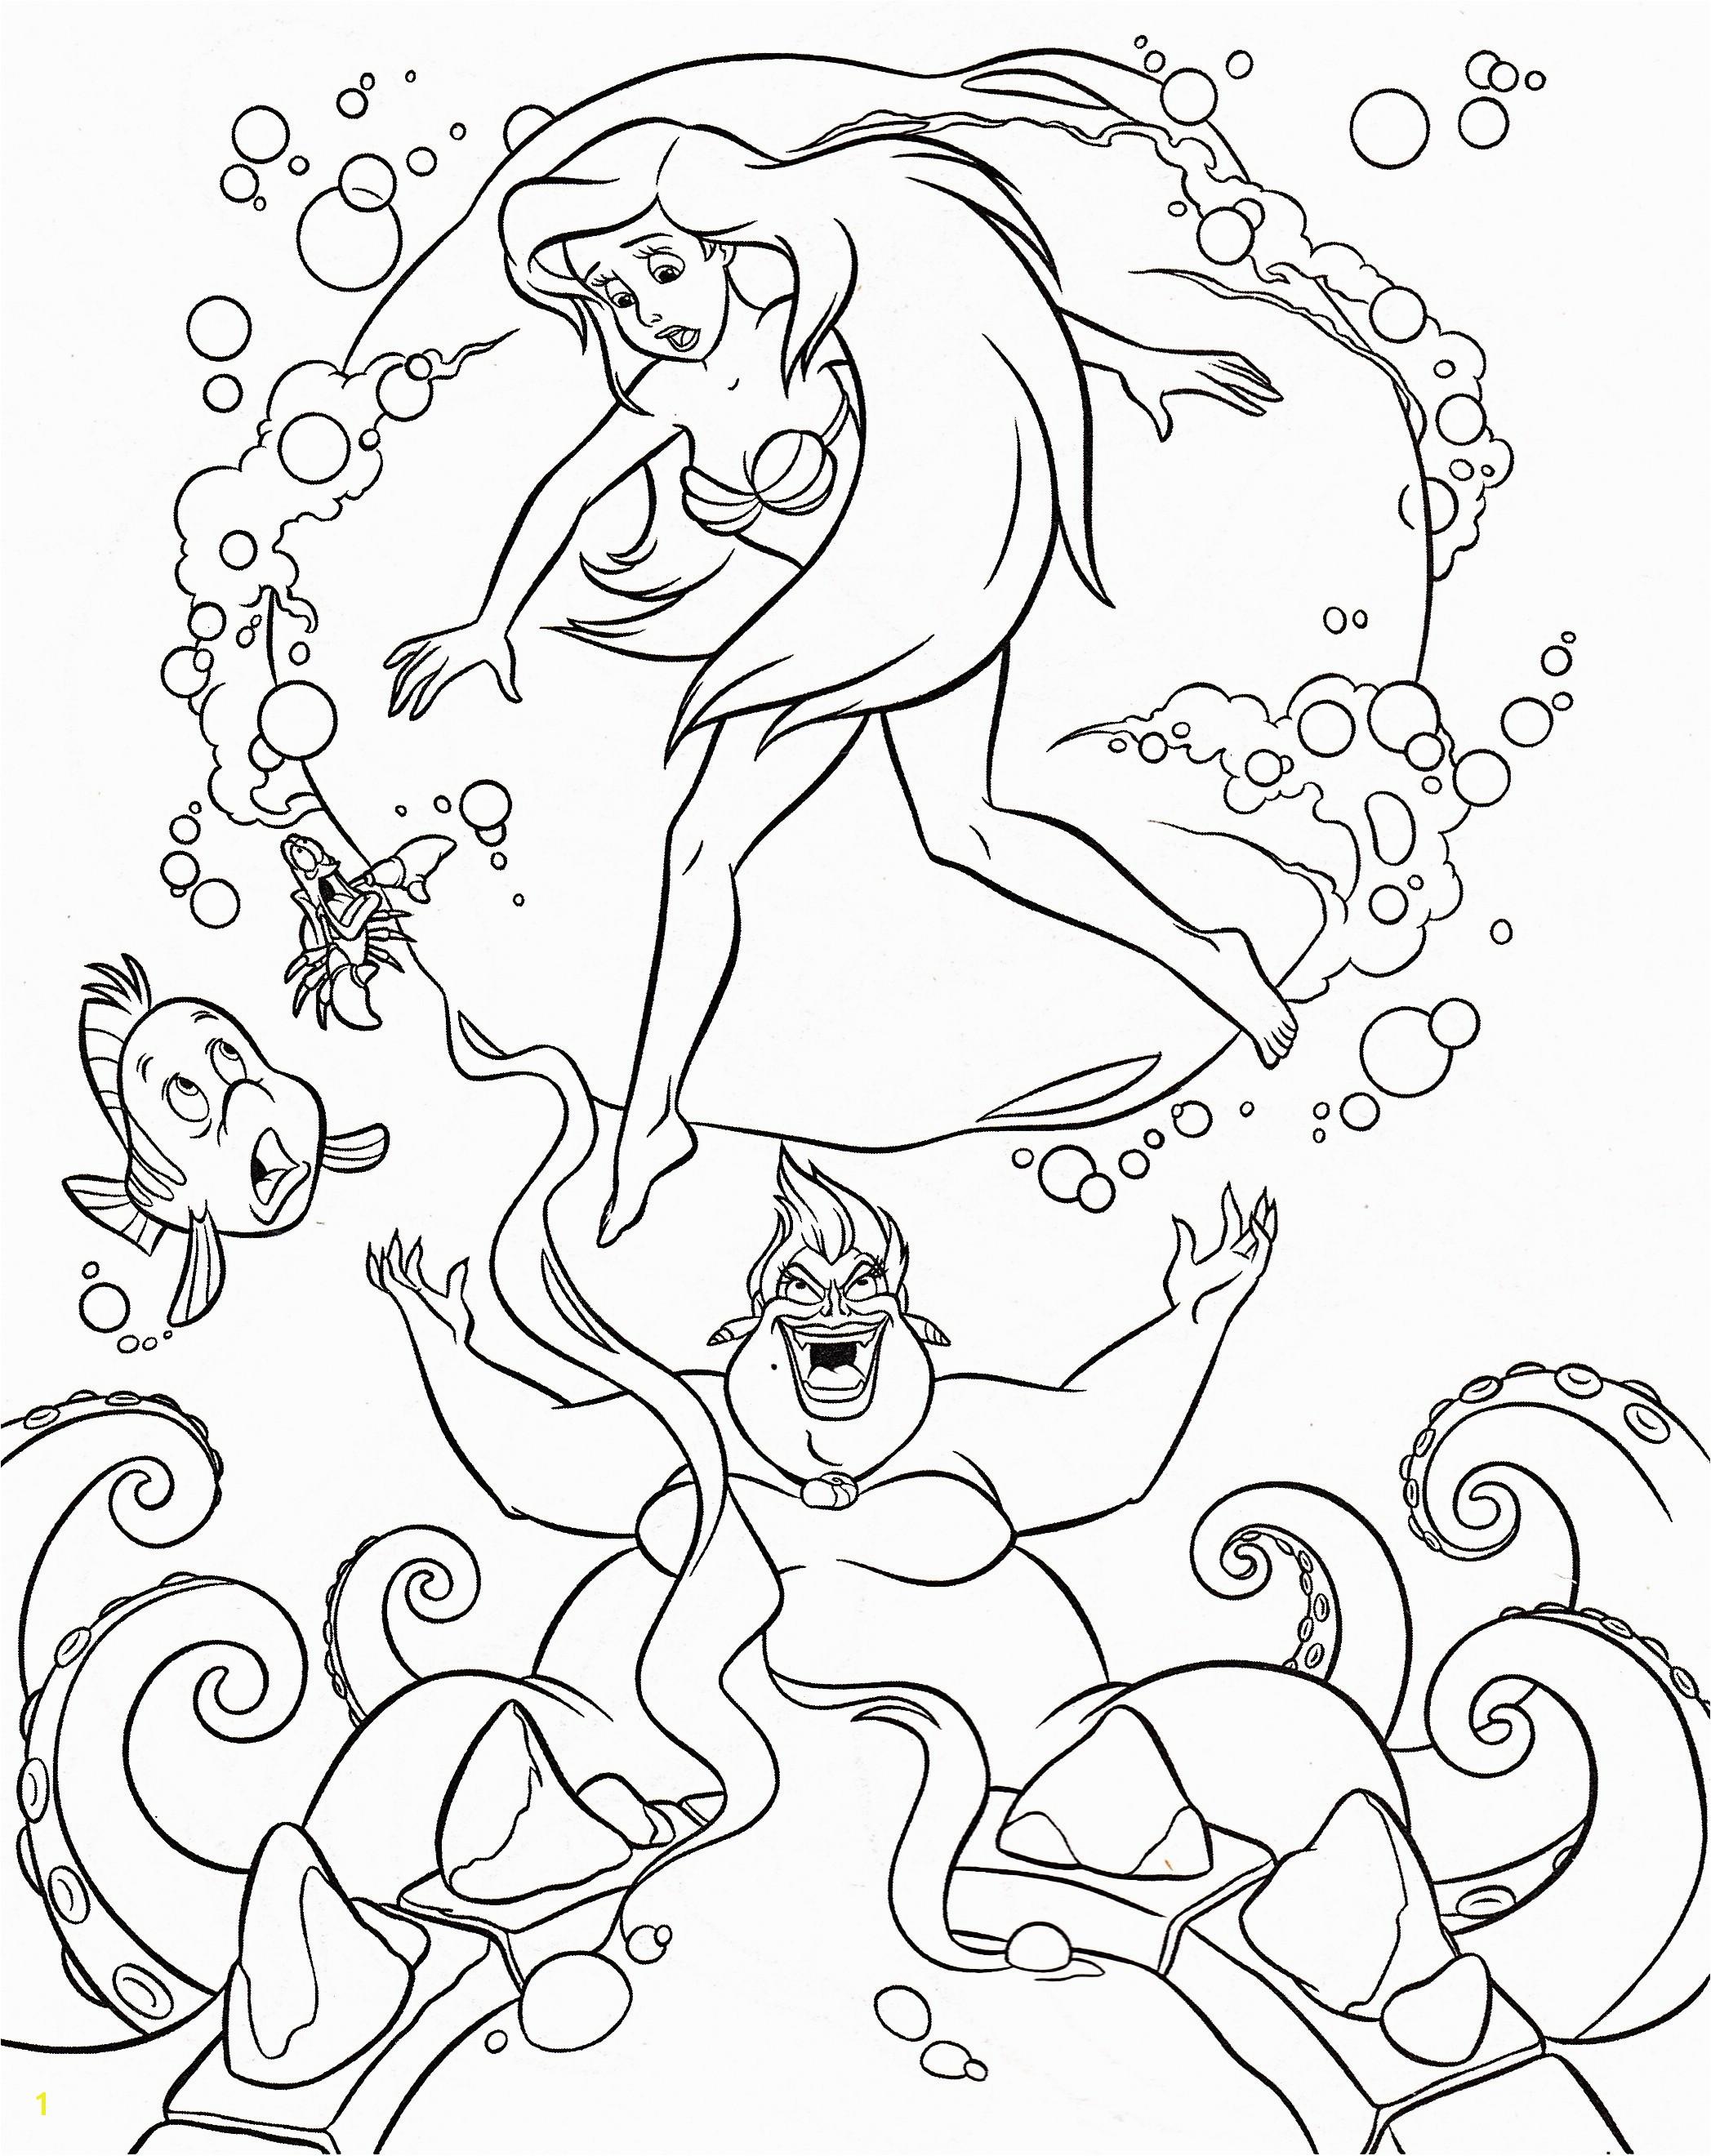 Disney Coloring Pages Frozen Inspirational Disney Coloring Pages Printable Inspirational Fresh Walt Disney Disney Coloring